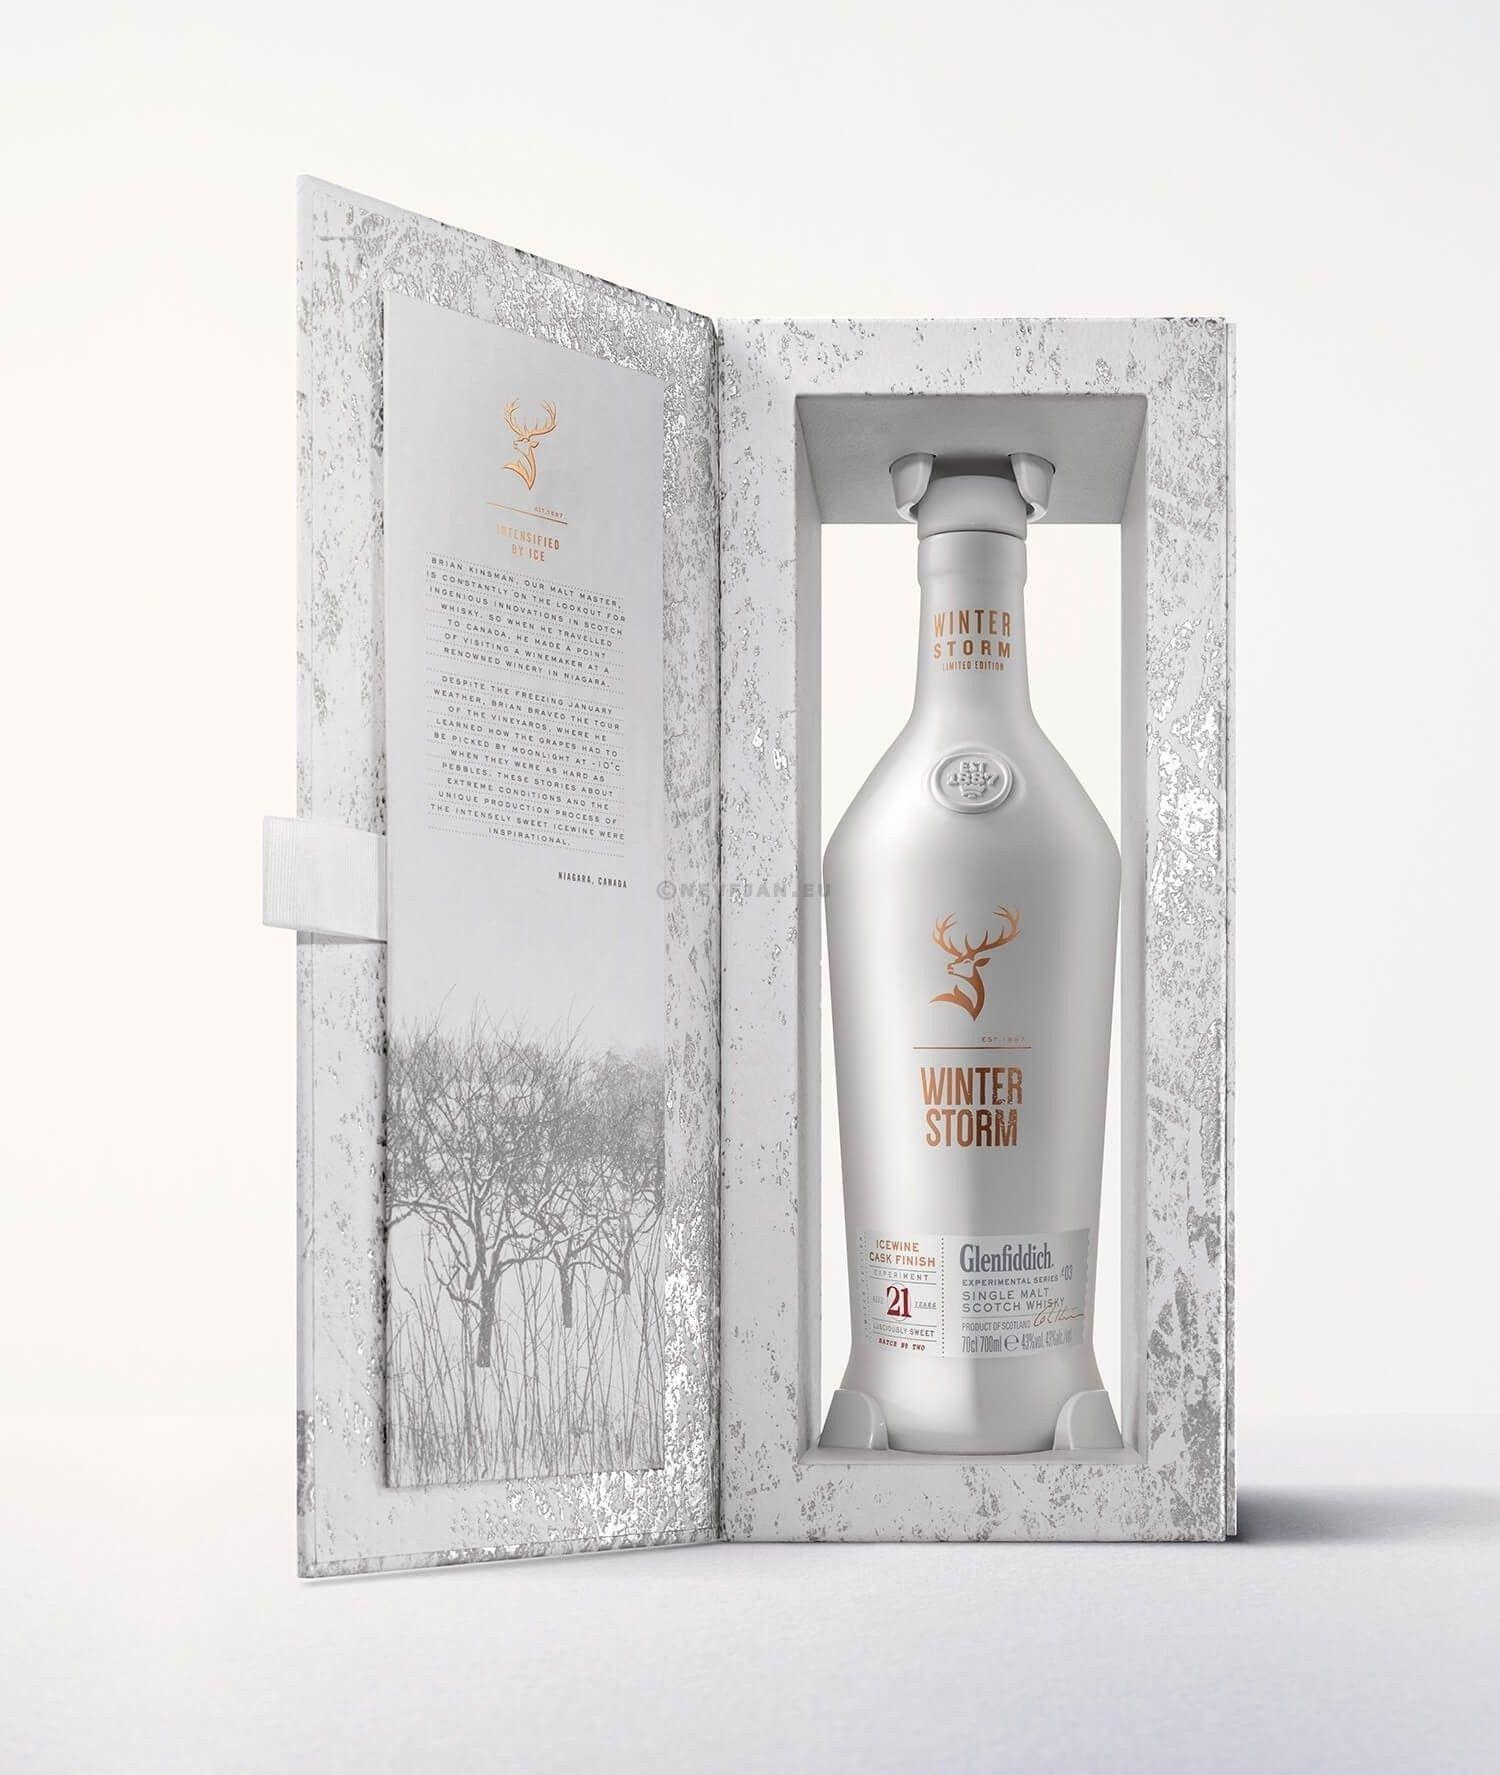 Glenfiddich Winter Storm 21 Ans d'Age 70cl 43% Speyside Single Malt Whisky Ecosse